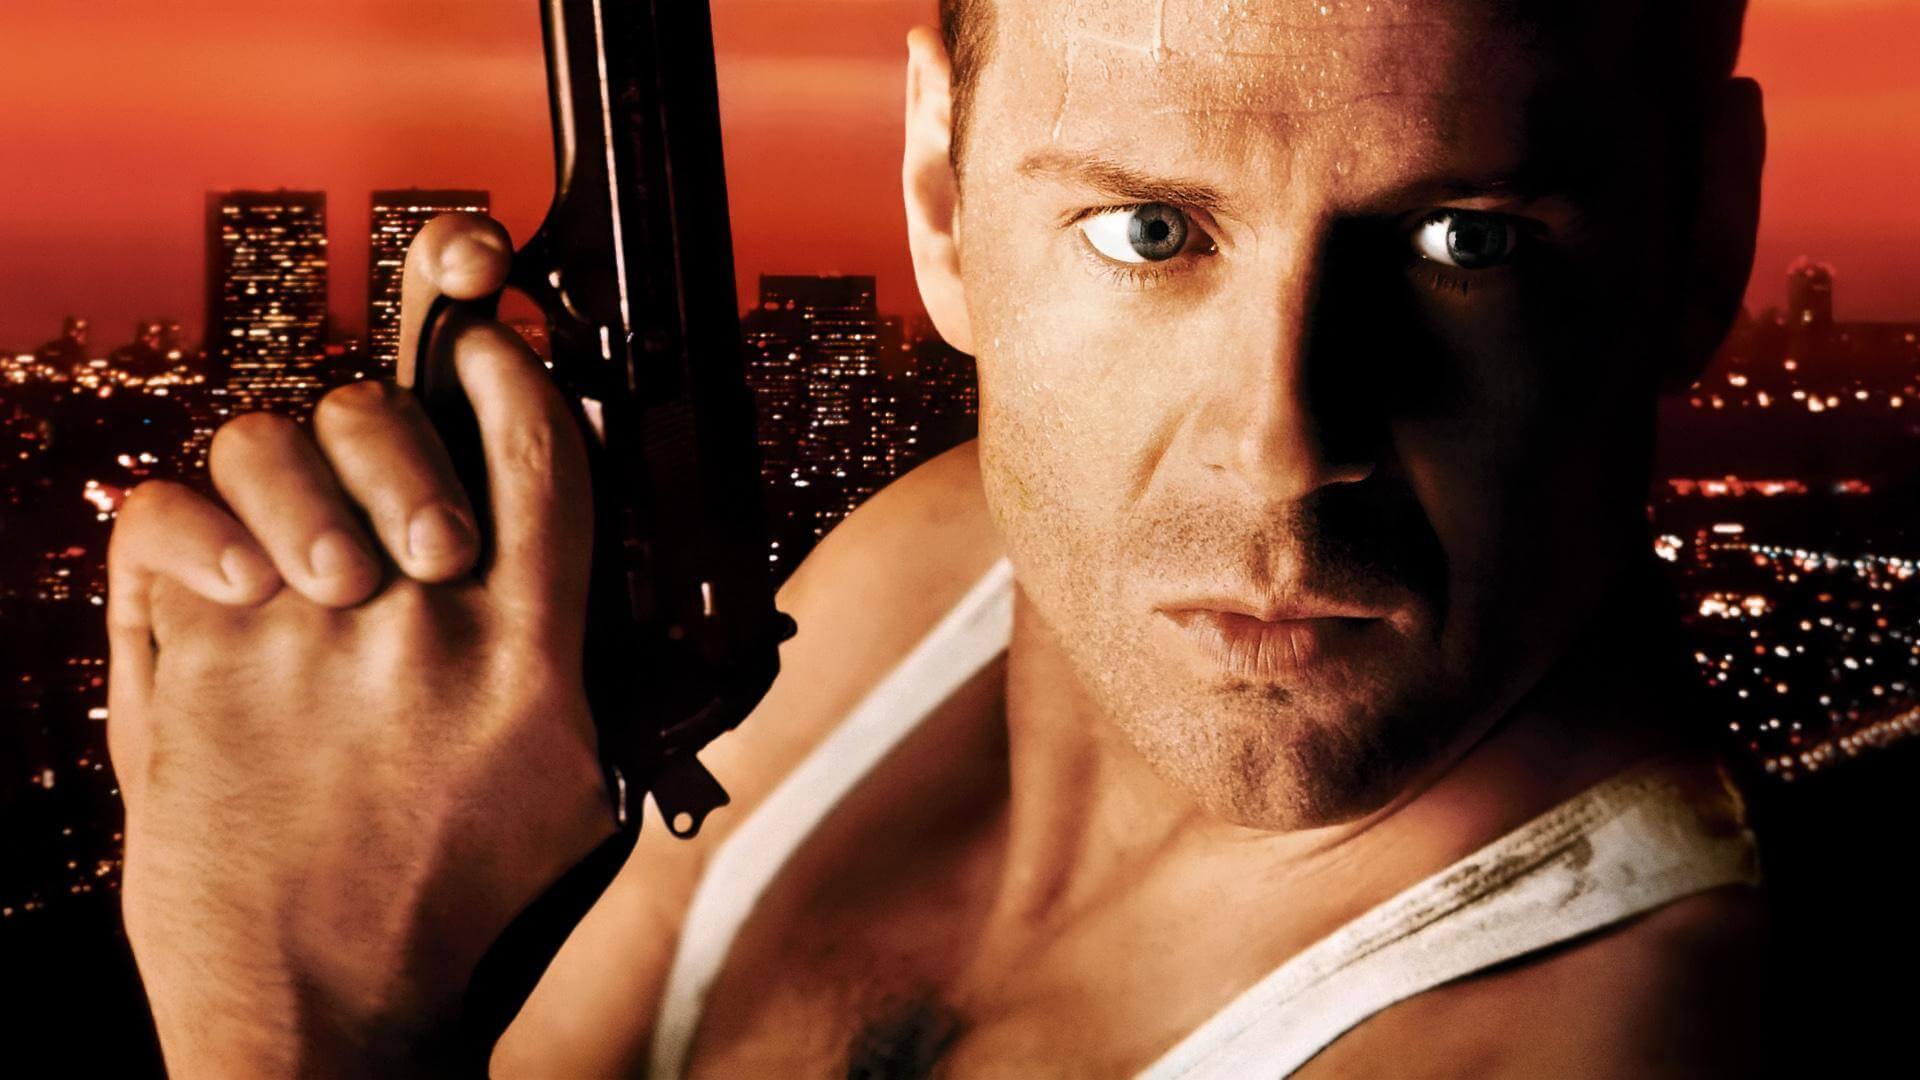 Den du skal se og den du IKKE skal se: Die Hard og Undercover